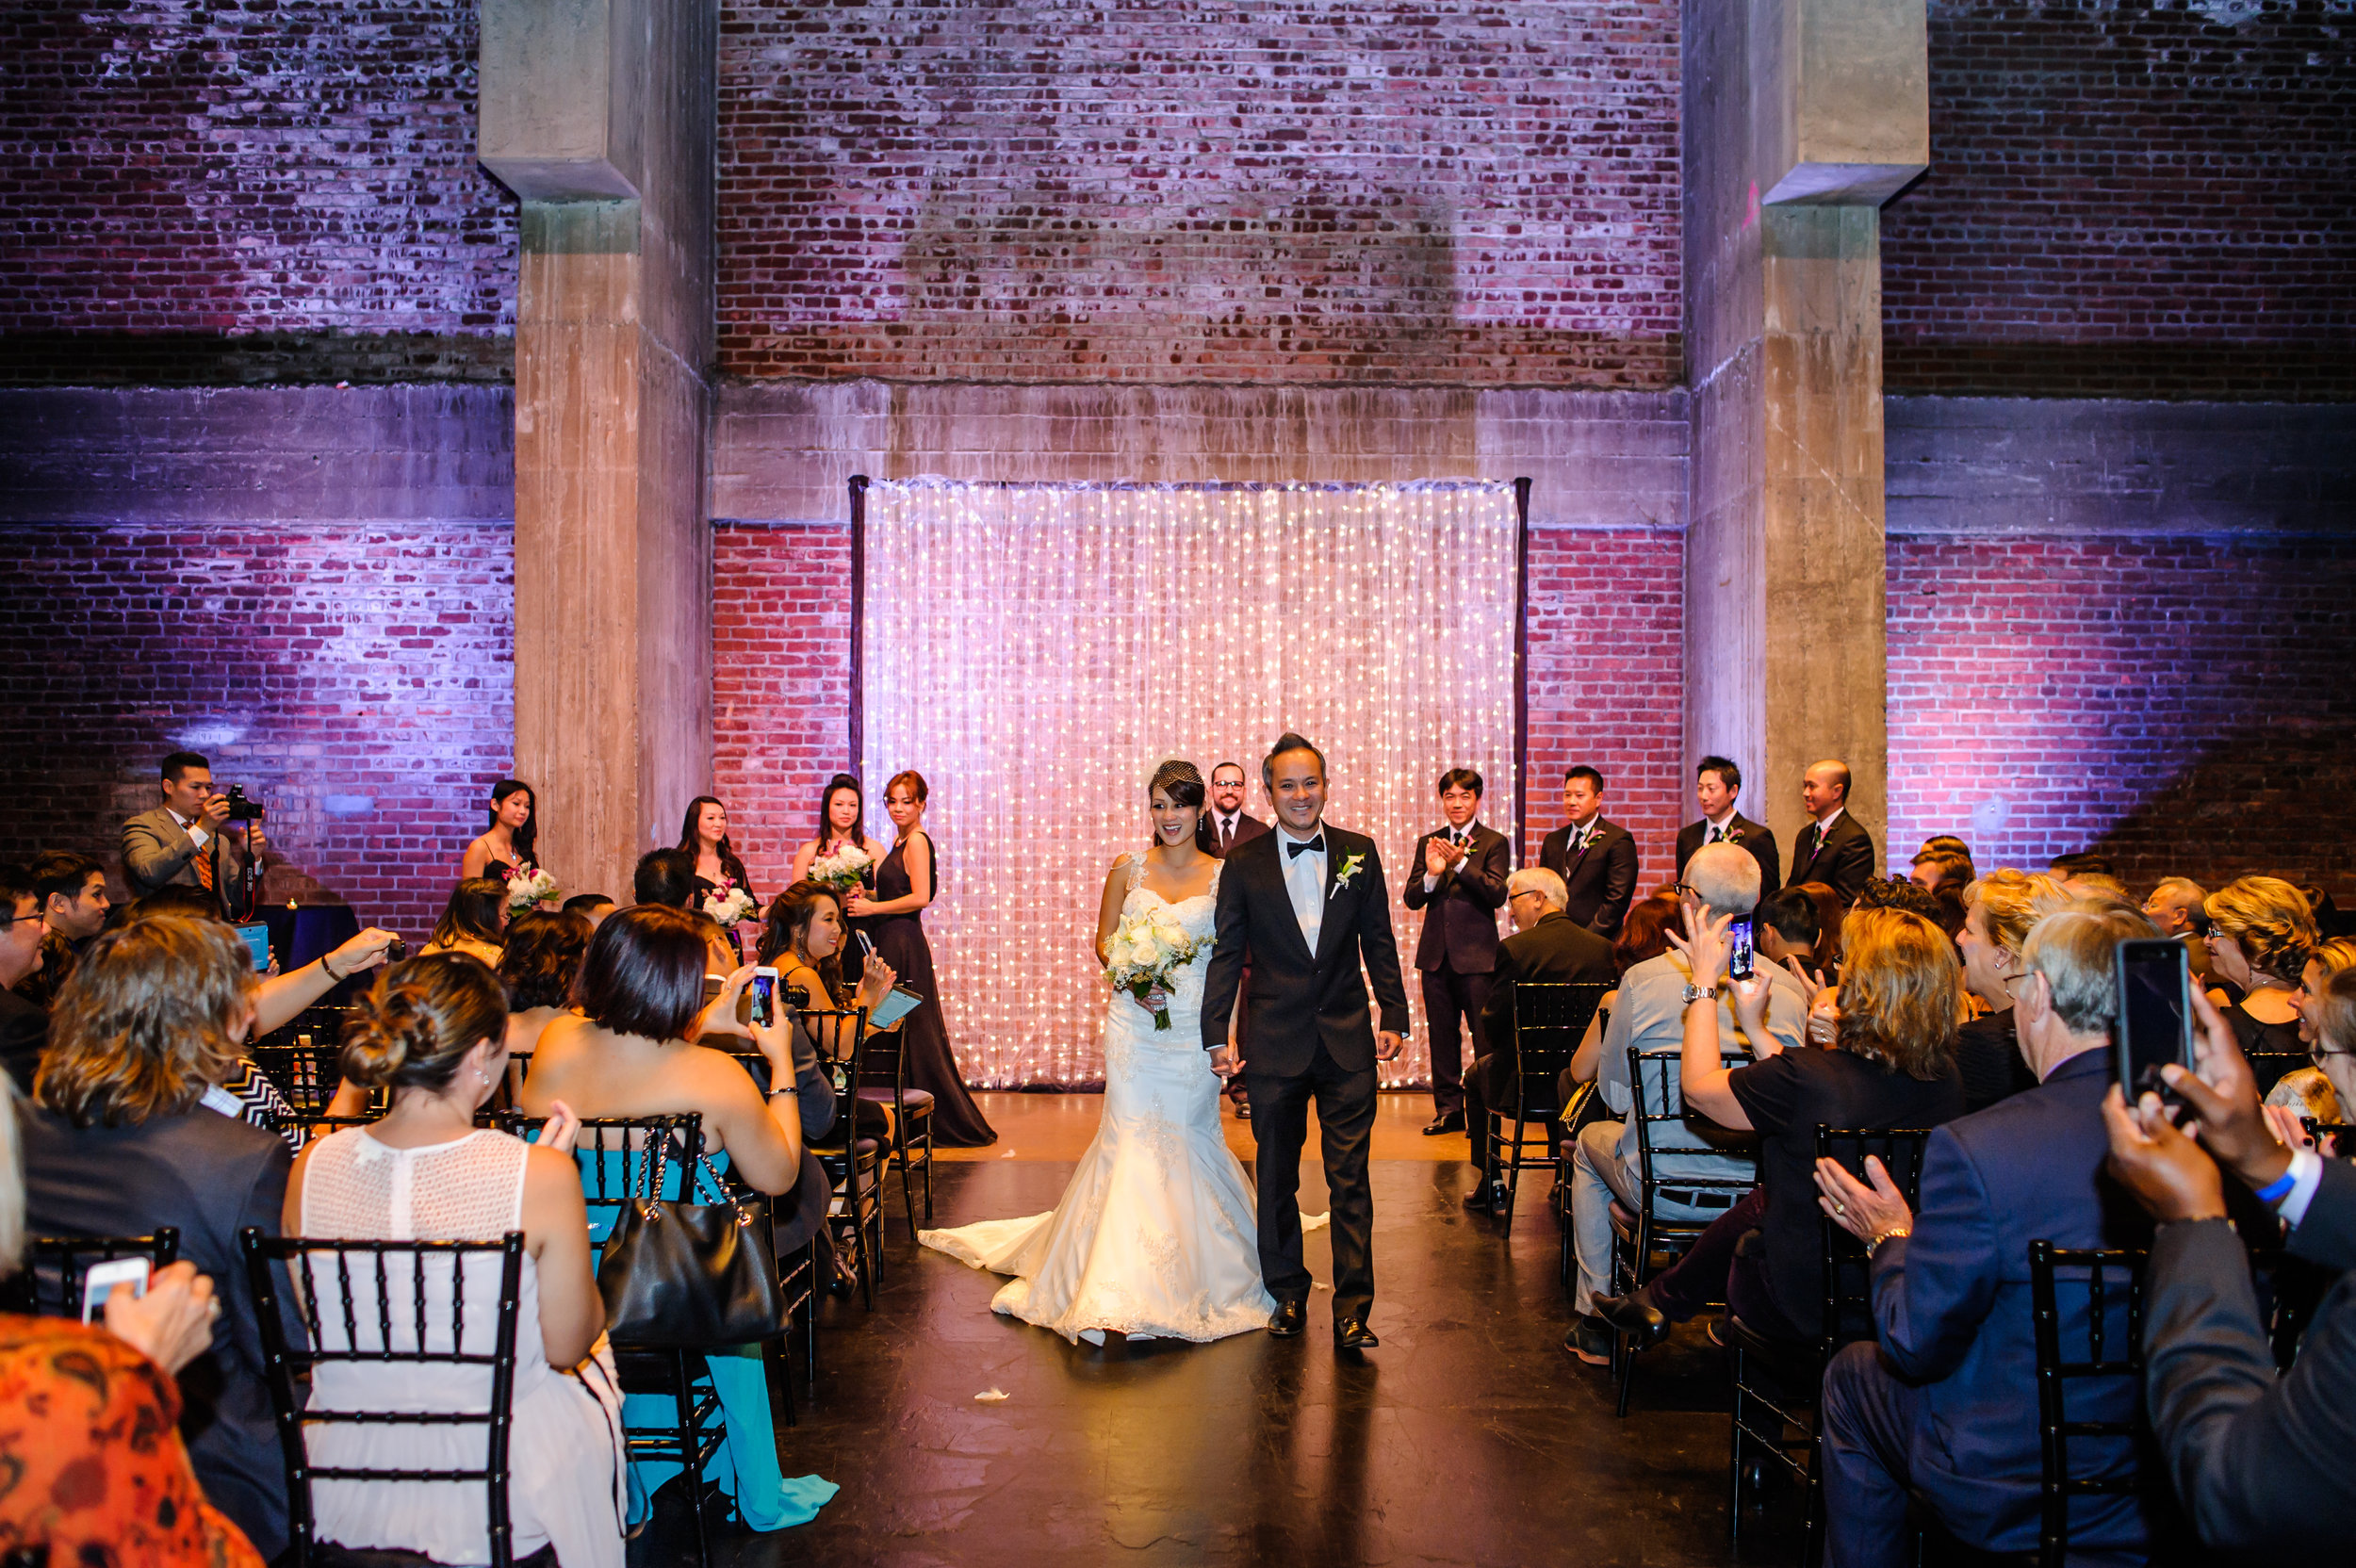 camilla-thuy-102-memorial-auditorium-sacramento-wedding-photographer-katherine-nicole-photography.JPG